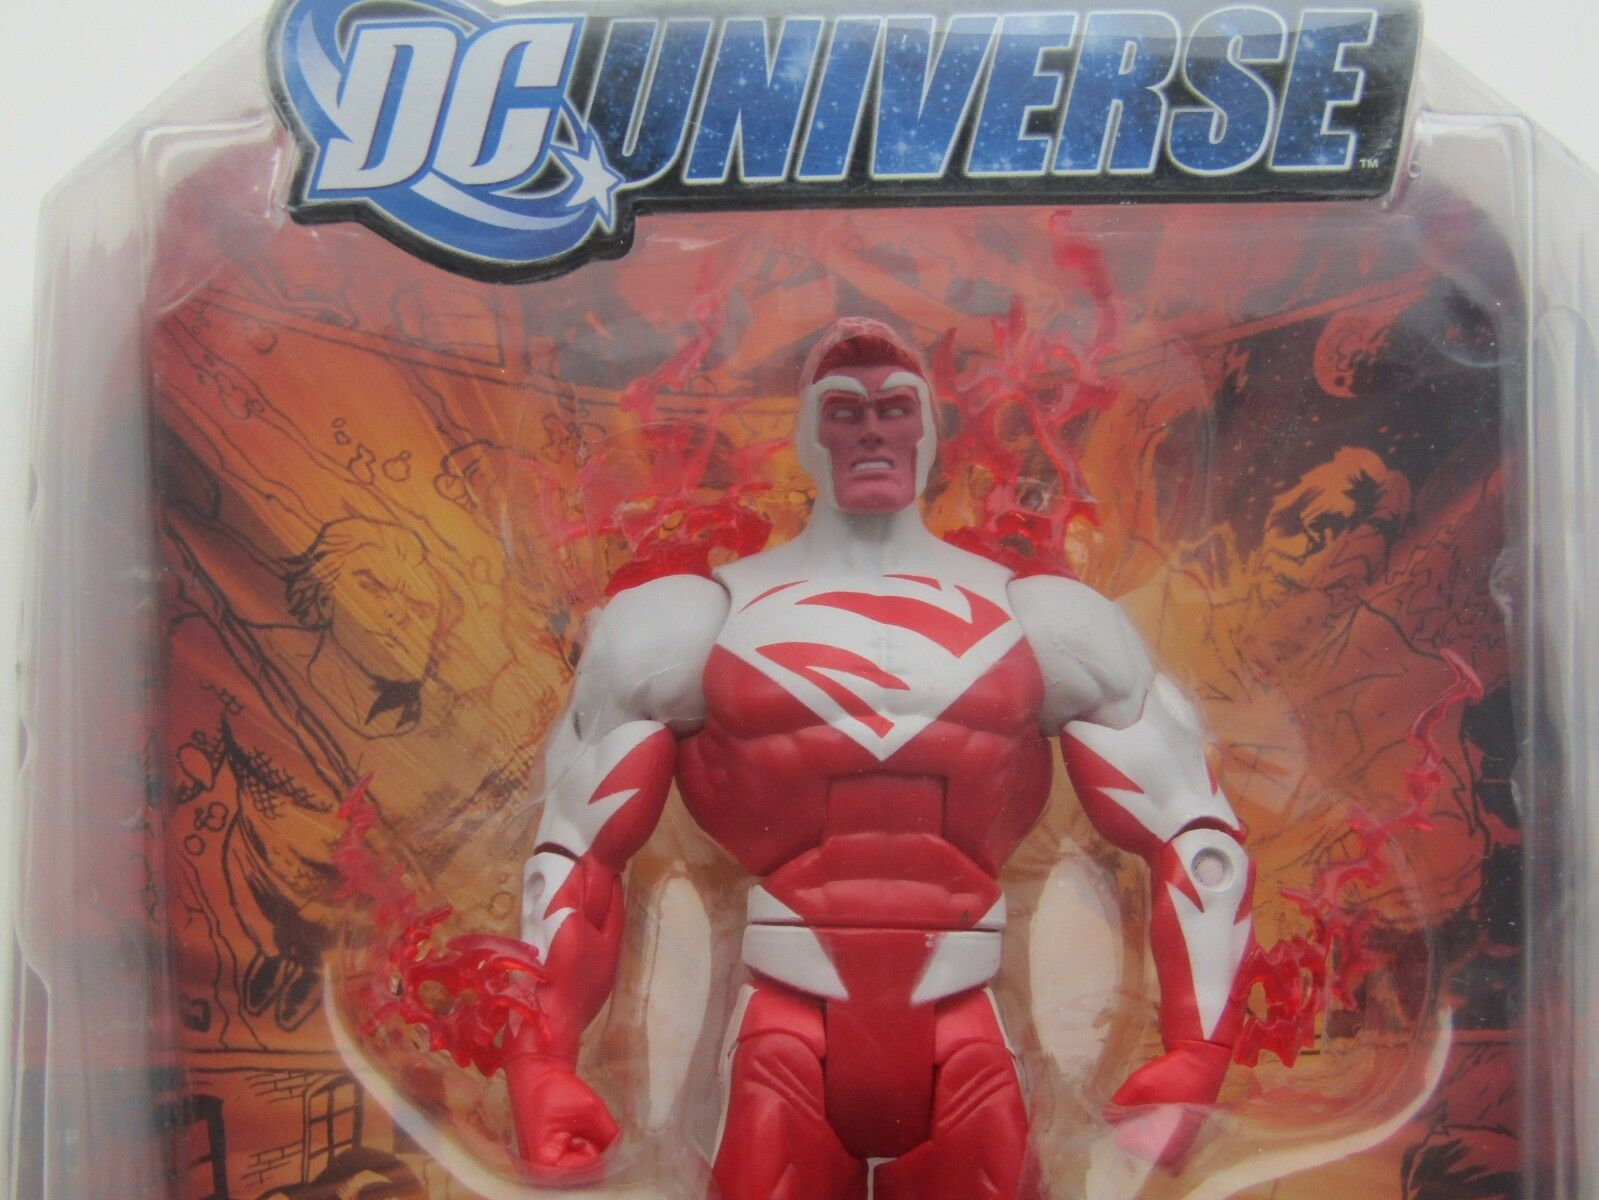 Mattel DCU DCUC  DC Universe classeeics rosso Superuomo  centro commerciale online integrato professionale